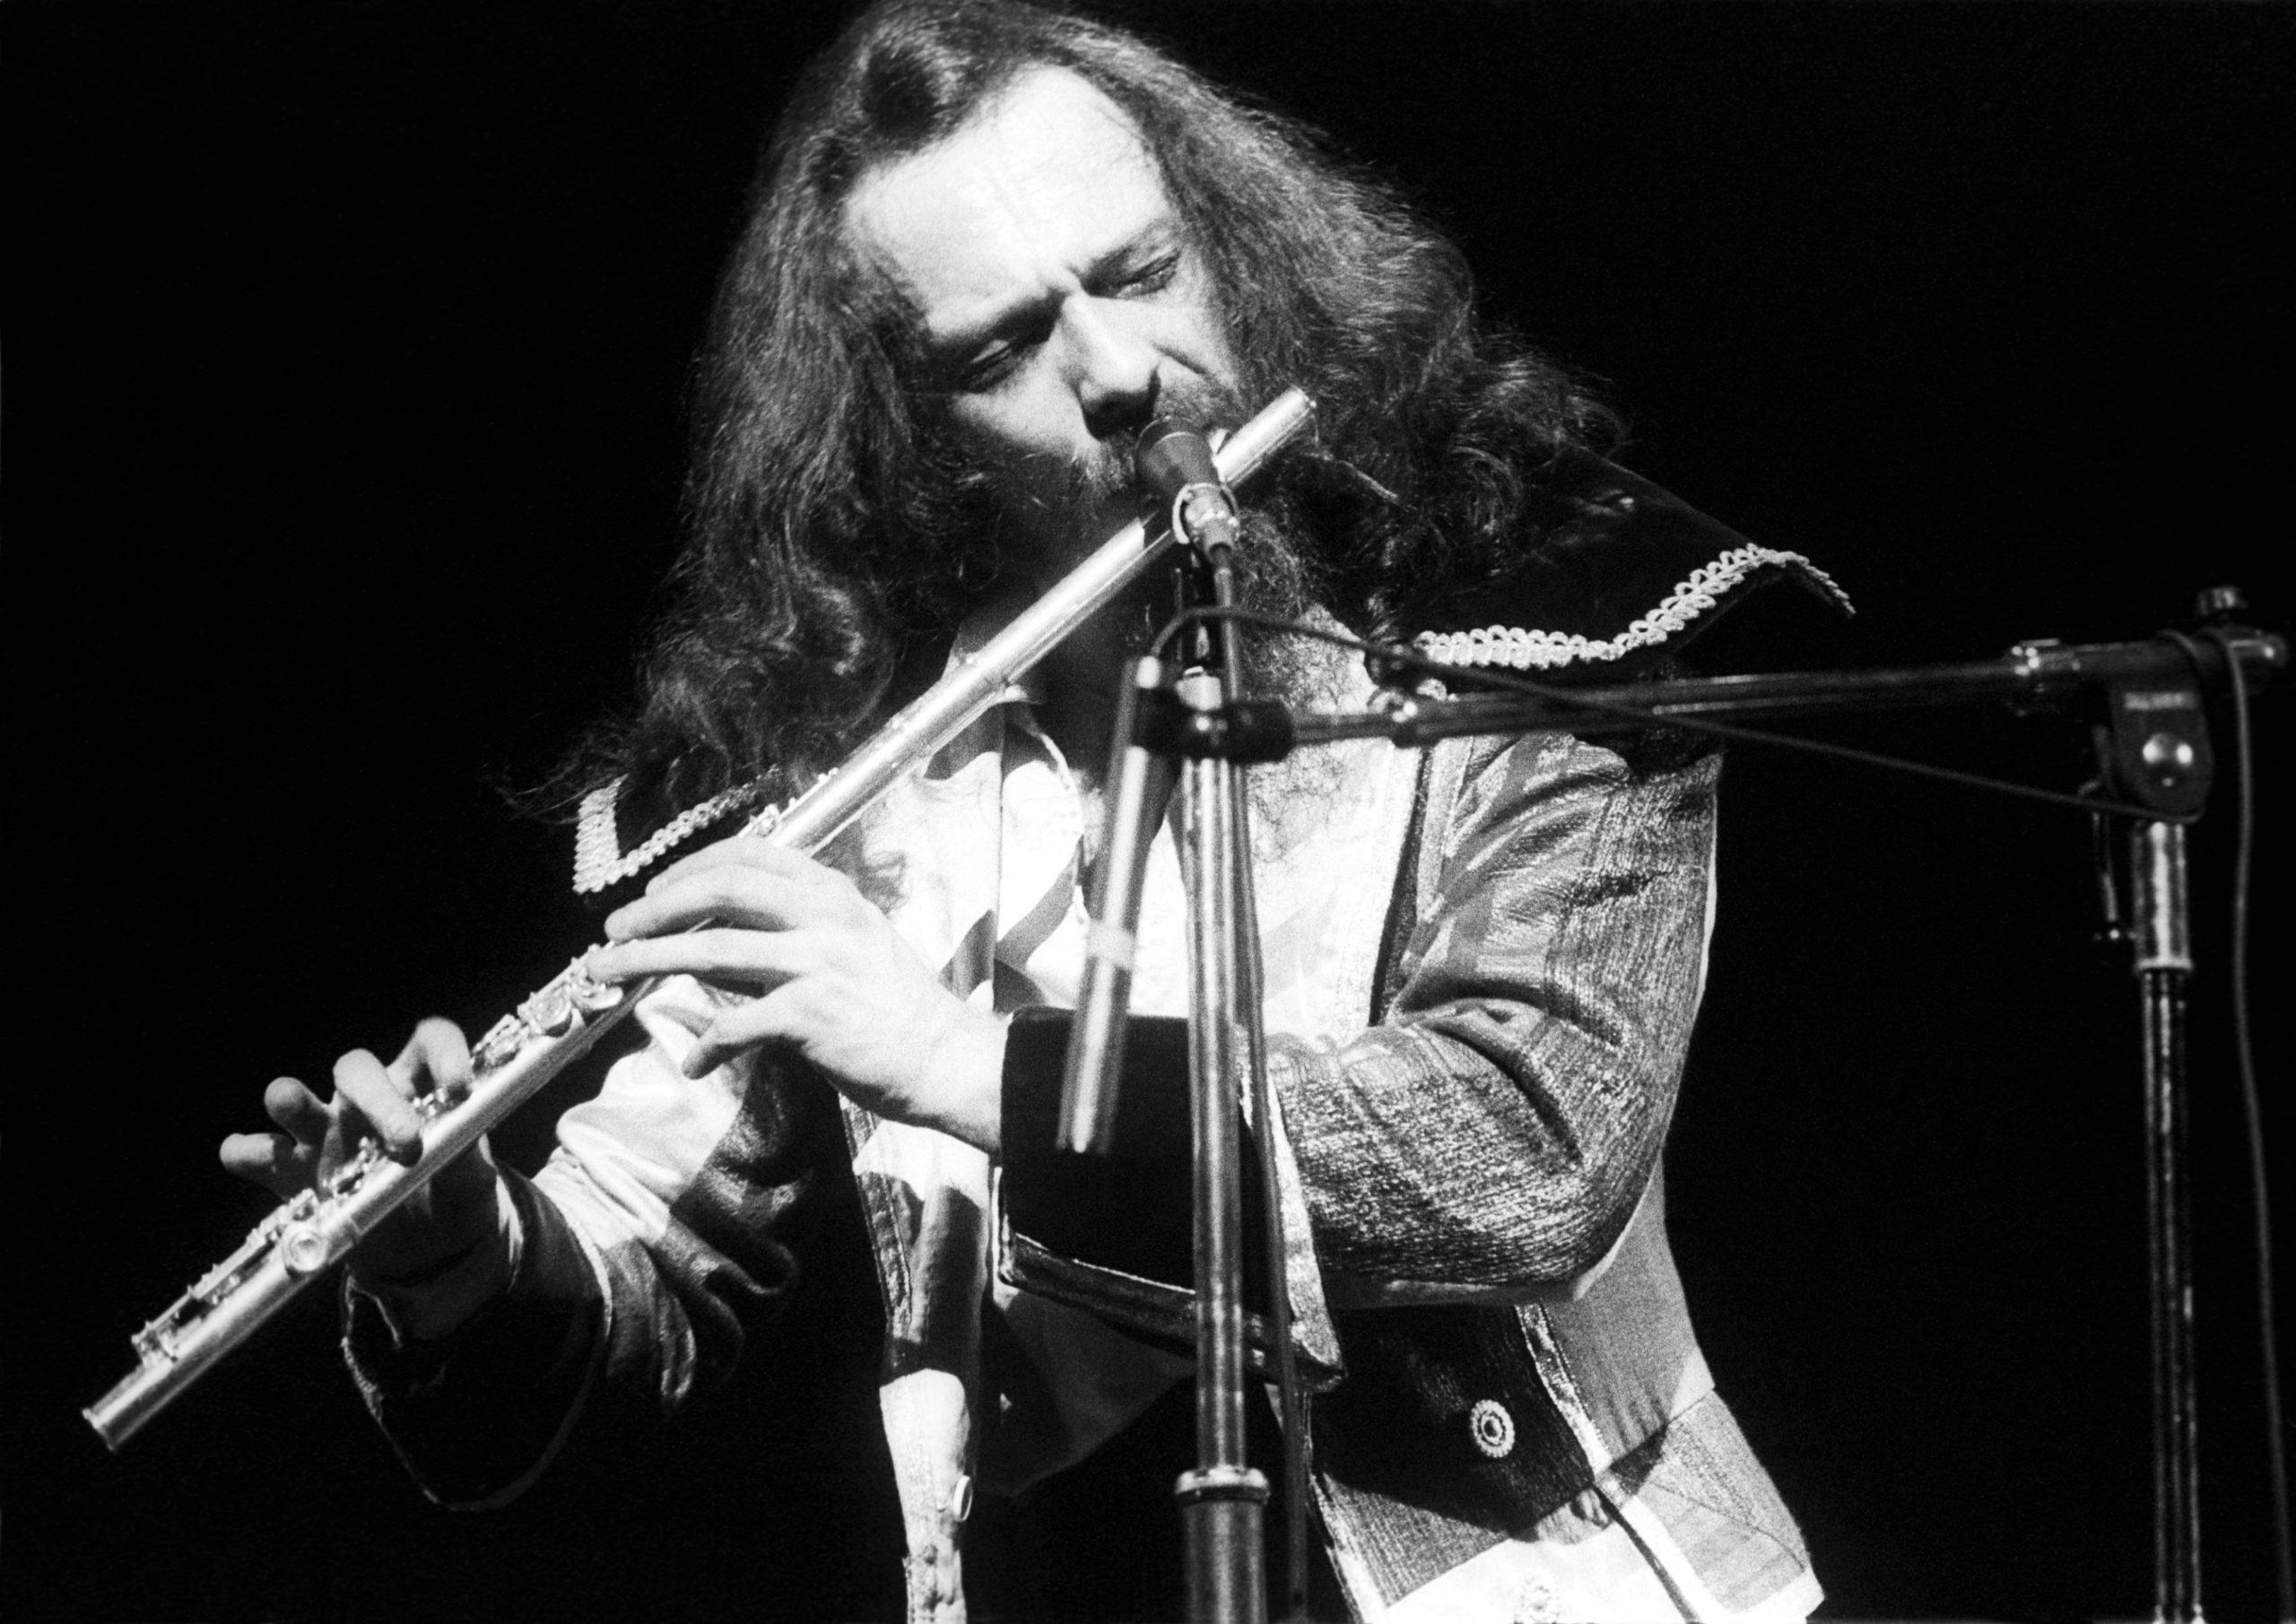 Jethro Tull Anderson flauto